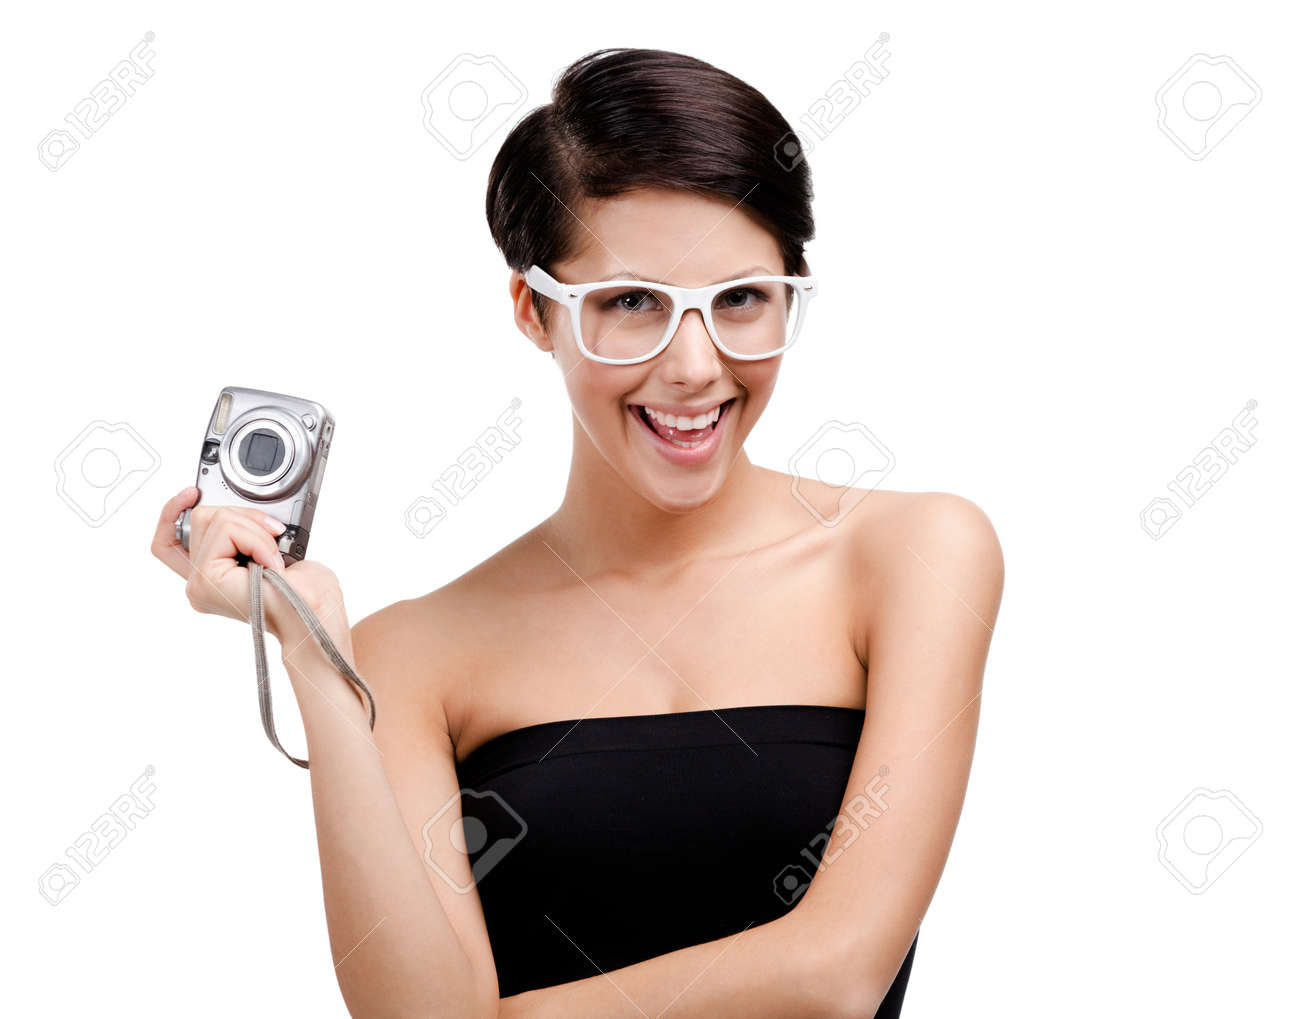 woman amateur free photo